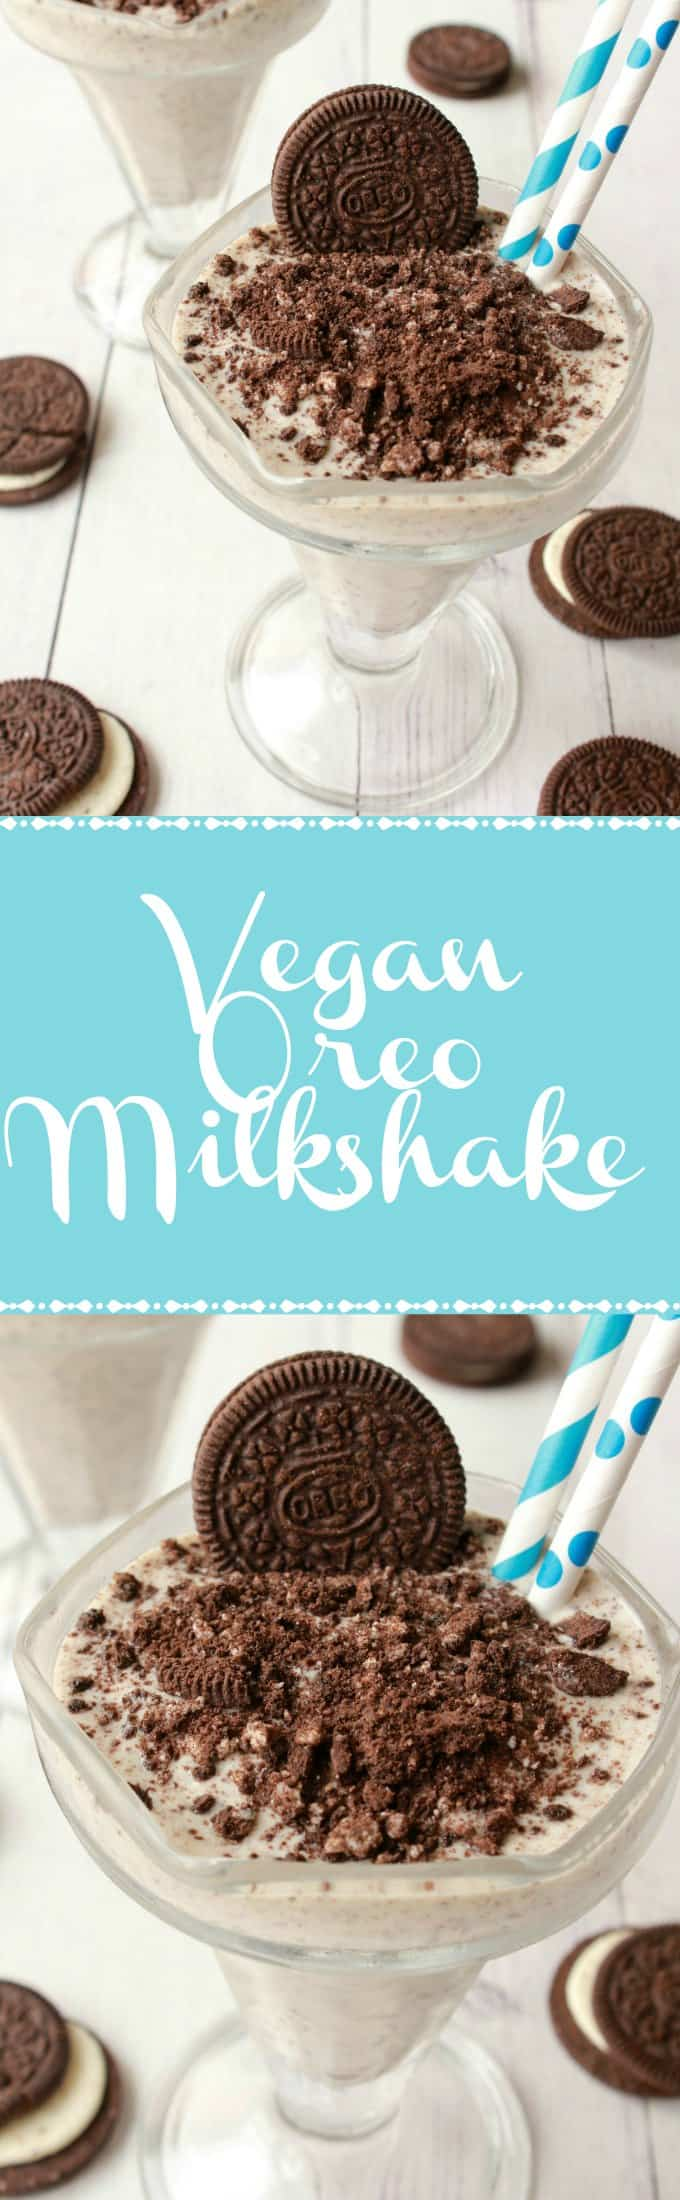 Super easy 3-ingredient Vegan Oreo Milkshake. This rich and creamy milkshake is ready in 5 minutes and makes a delicious dessert. Vegan | Vegan Dessert | Vegan Milkshake | Vegan Food | Vegan Recipes | lovingitvegan.com